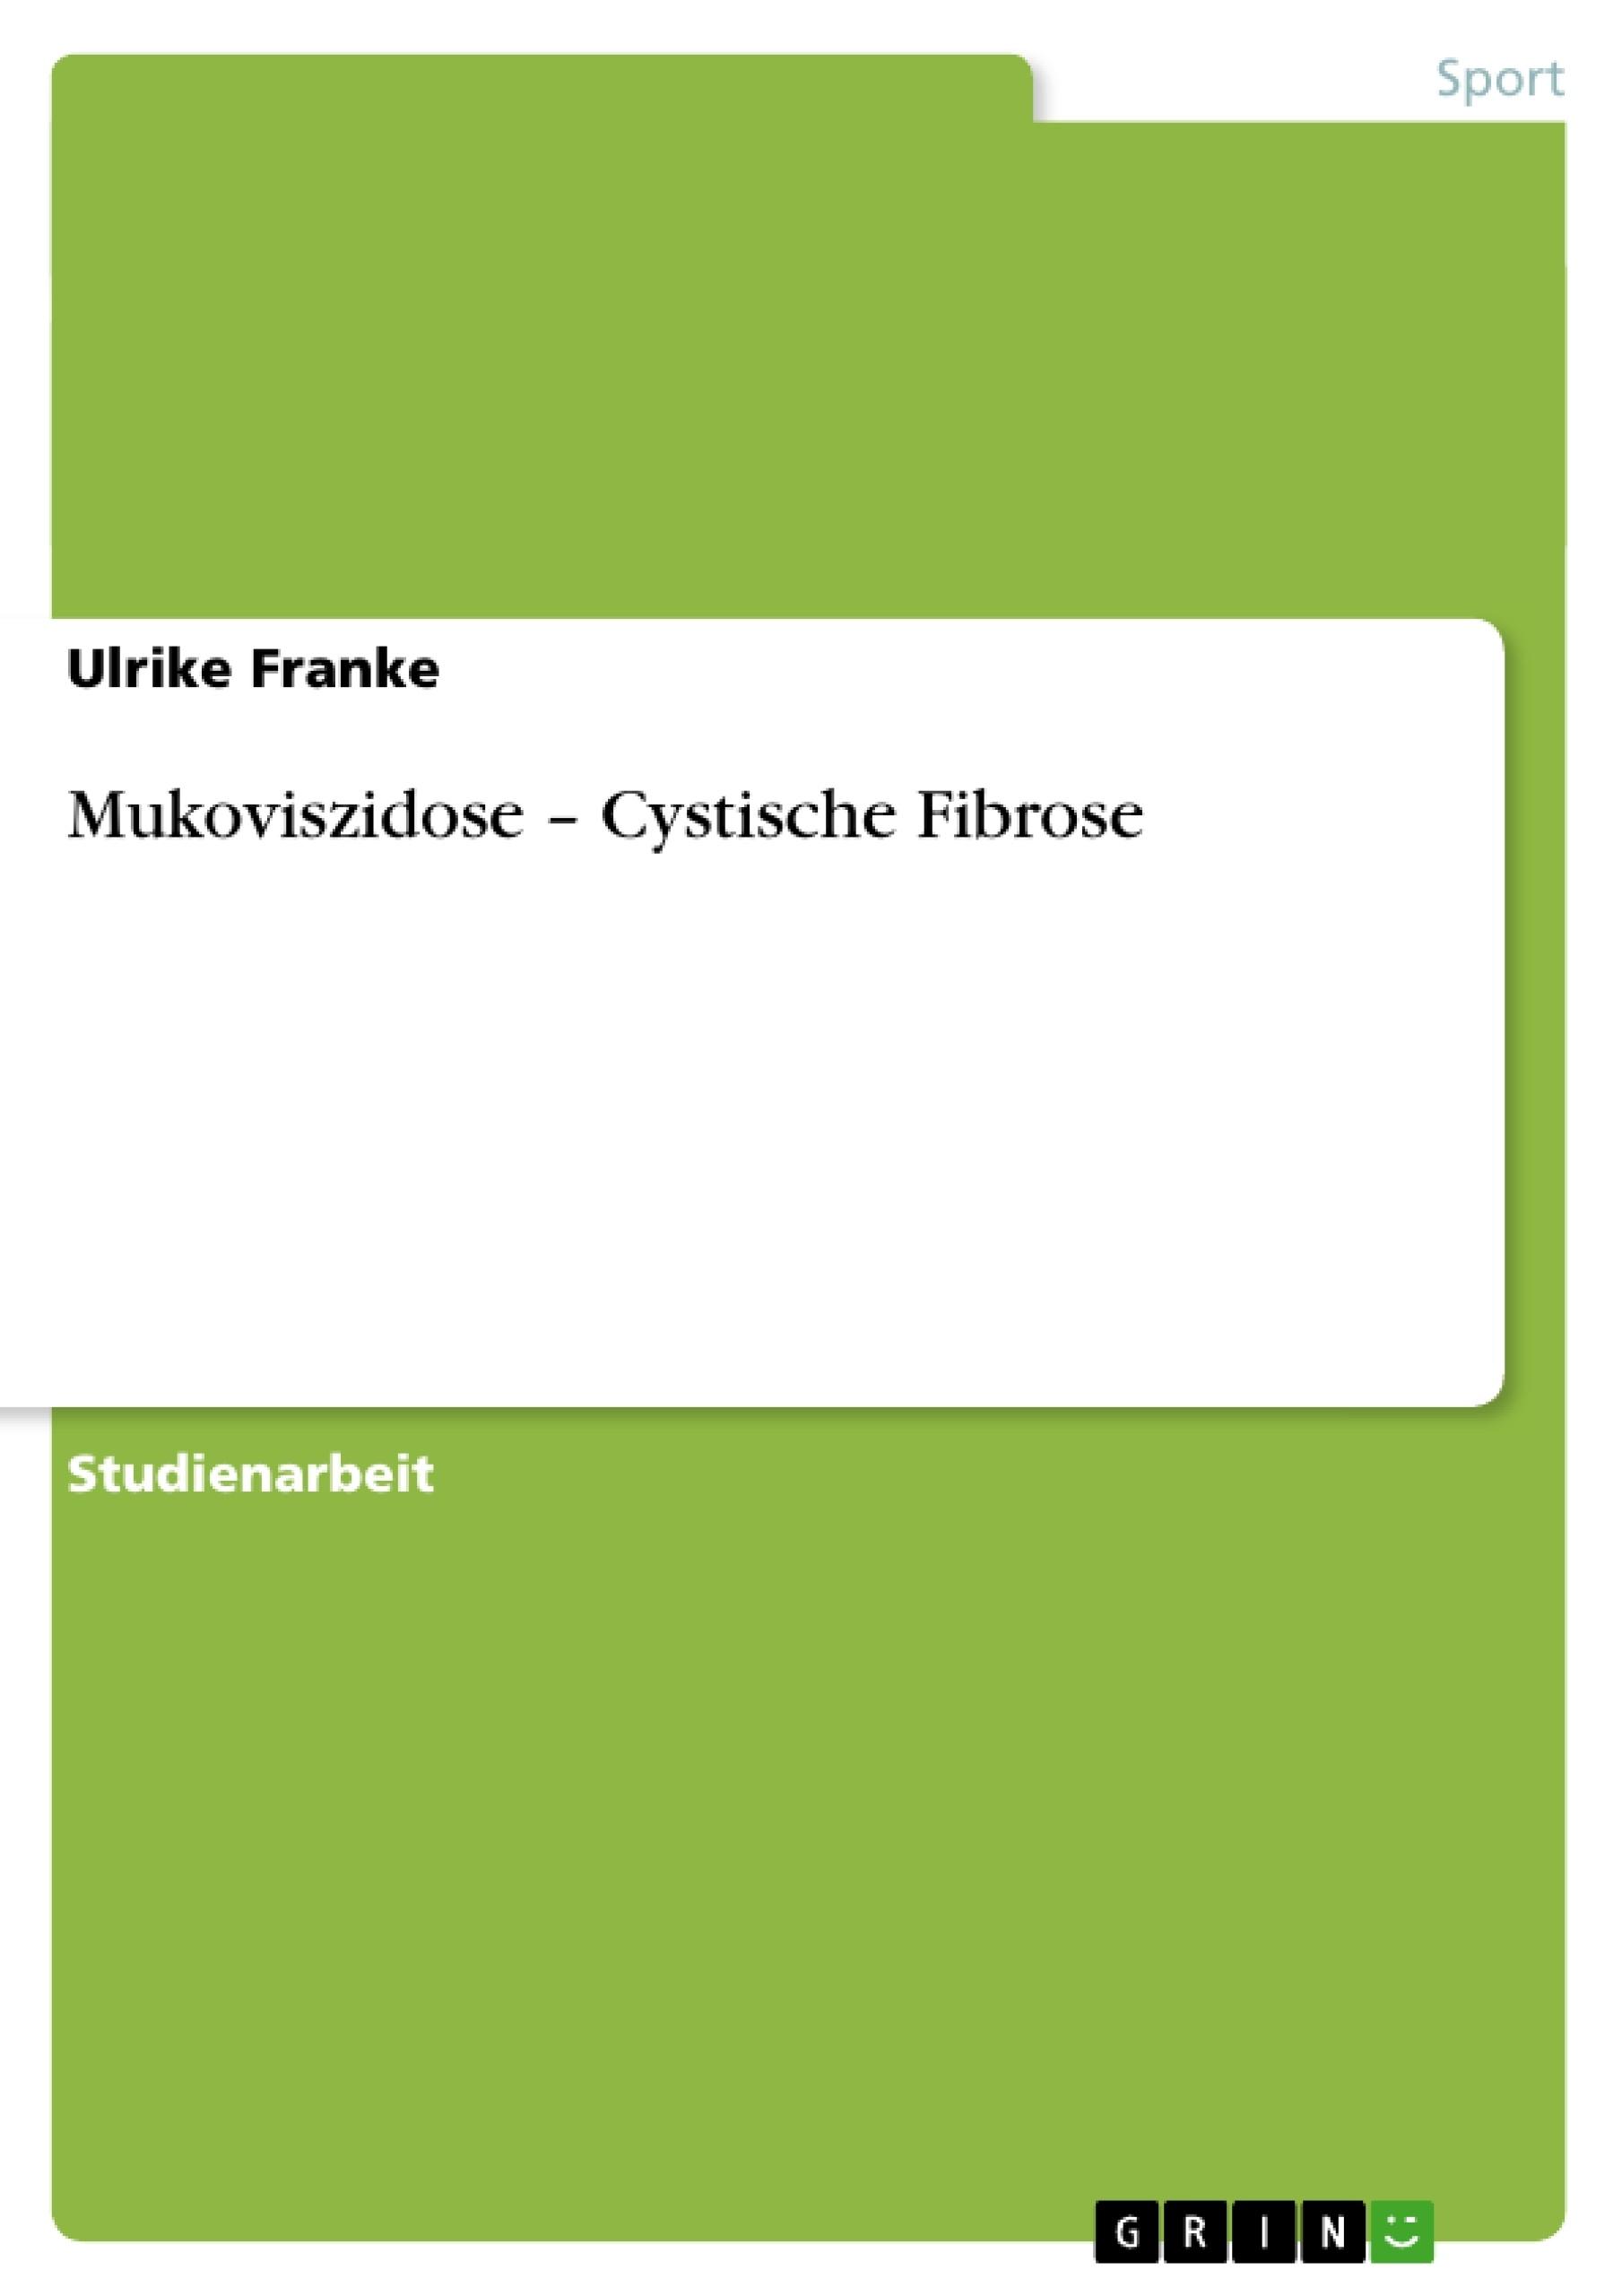 Titel: Mukoviszidose – Cystische Fibrose